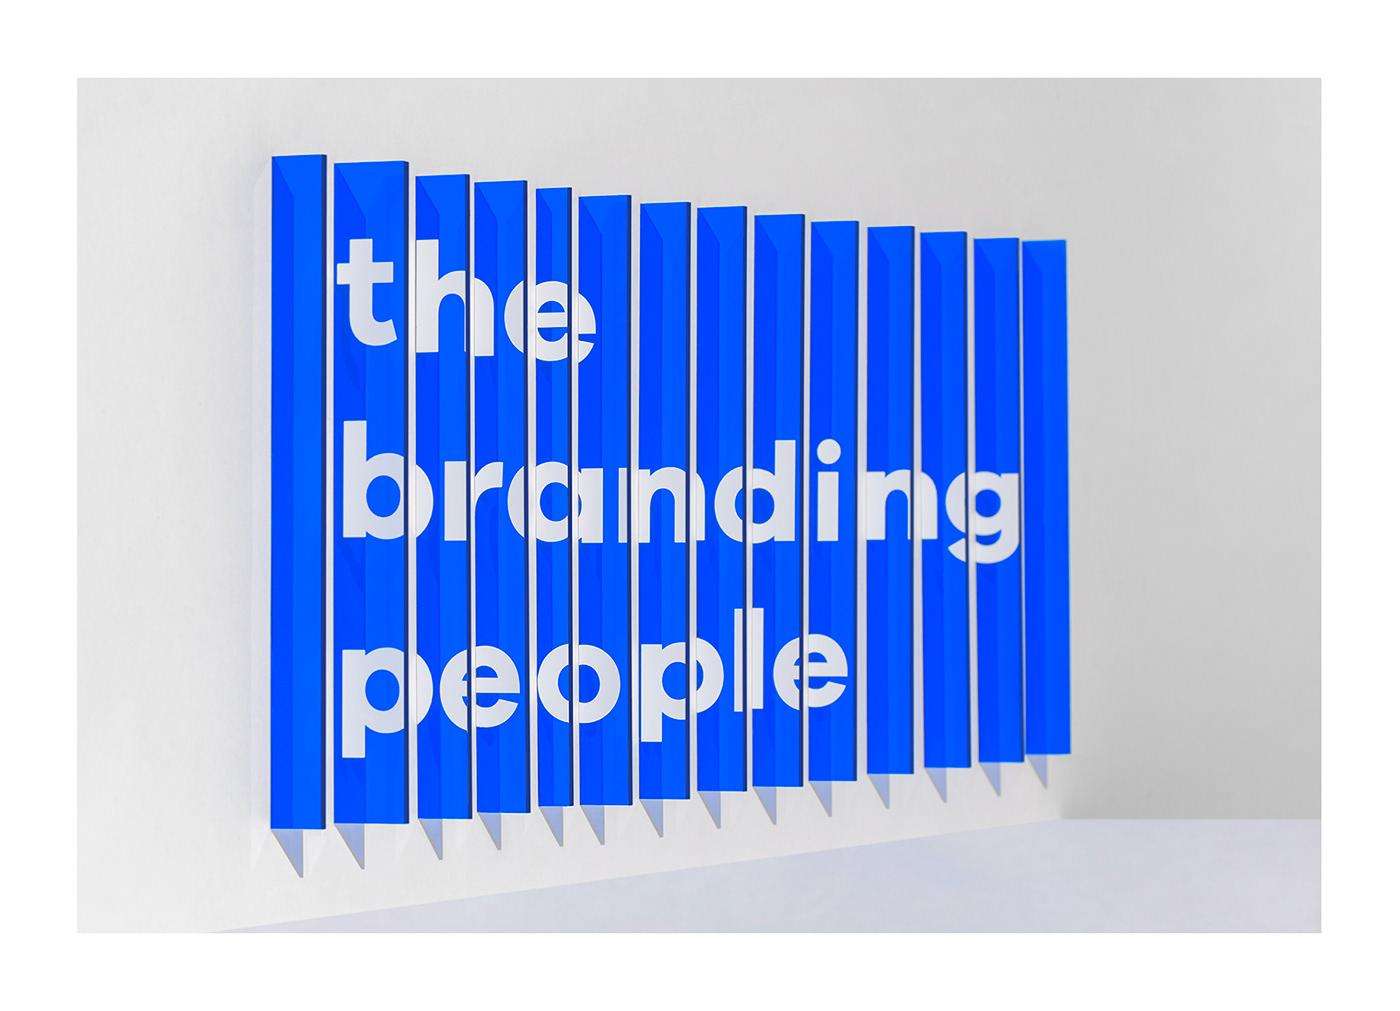 design brand graphic 3D Render people hands poster